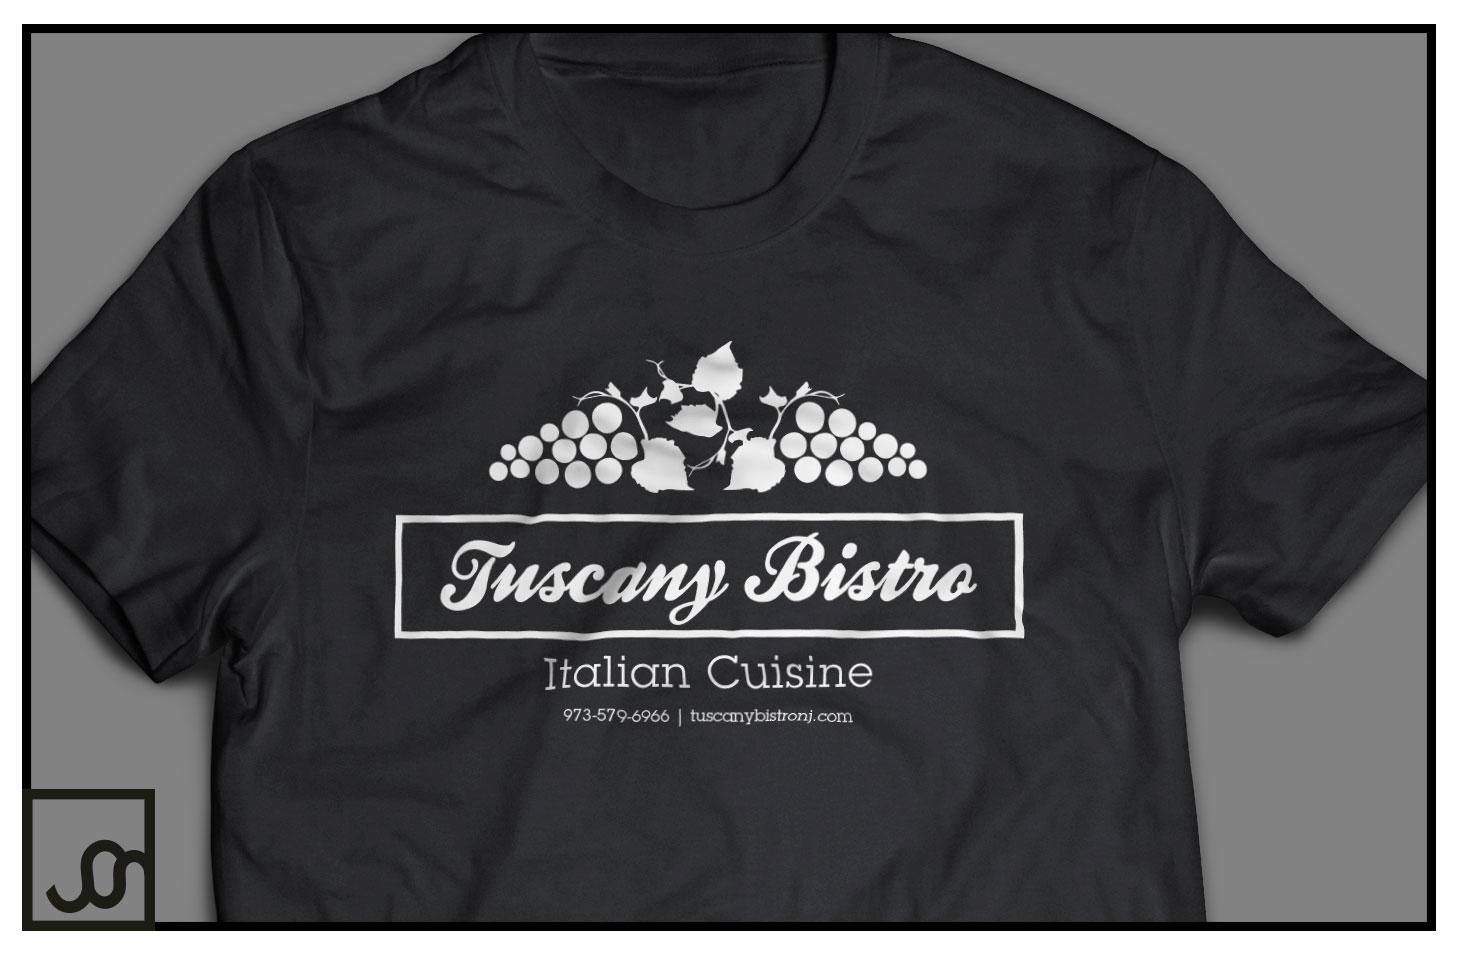 Tuscany Bistro